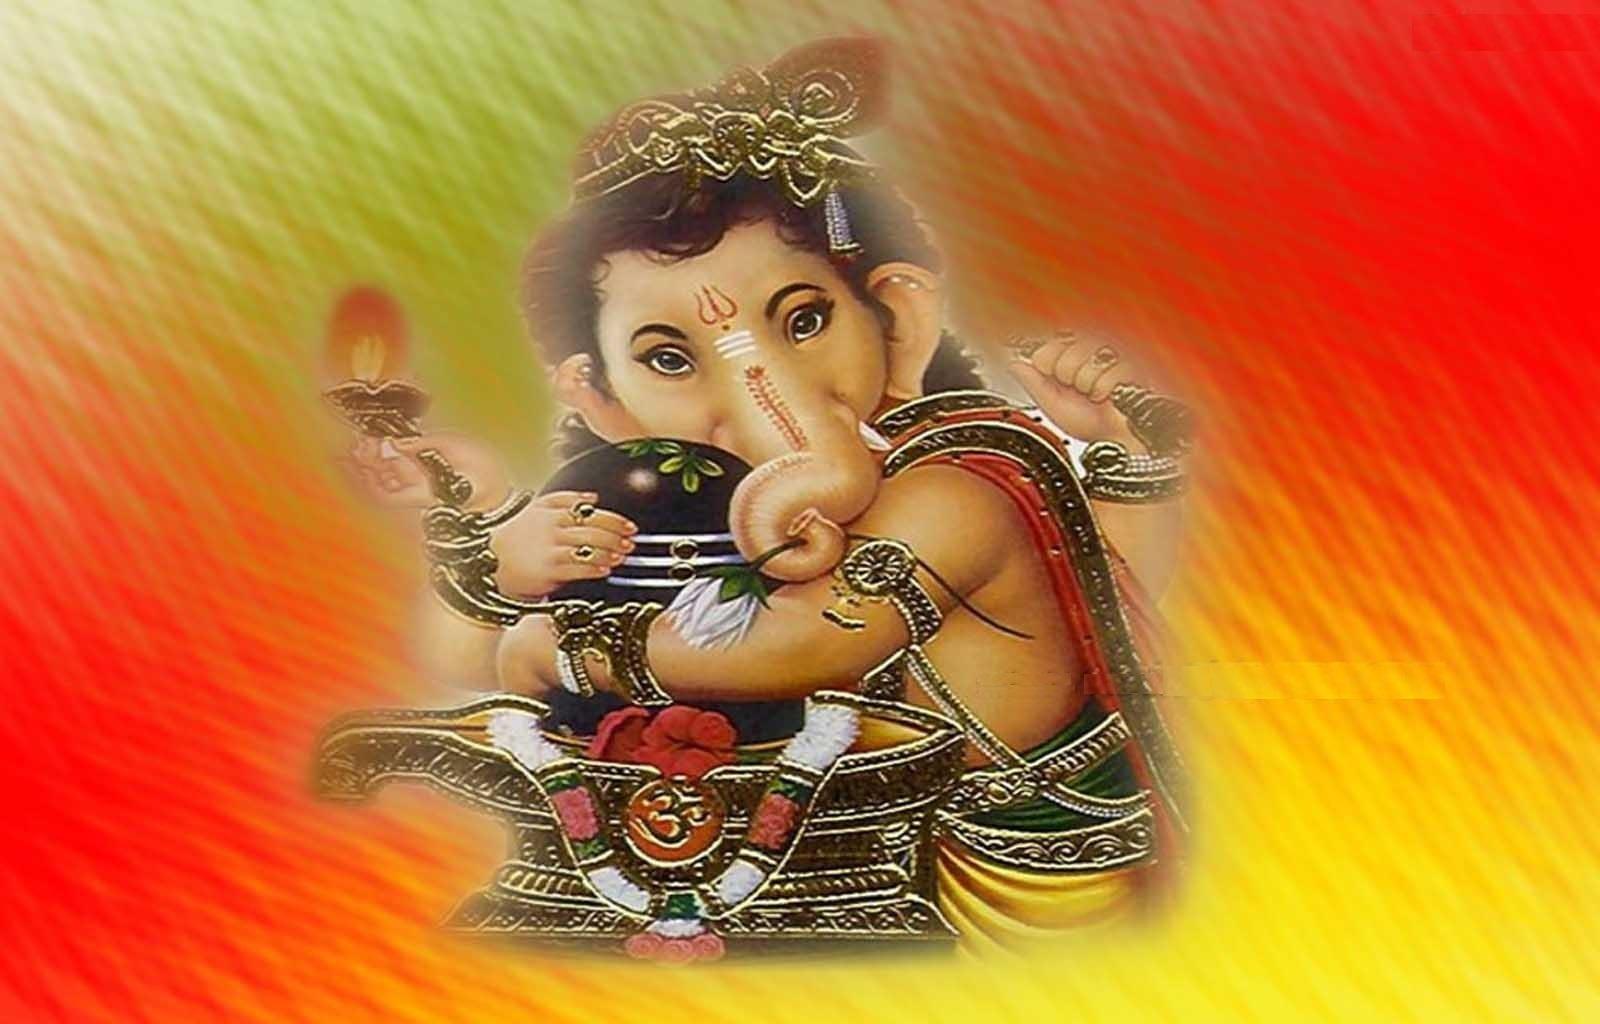 Free lord gaensh bhagwan hd wallpaper download festival - Ganesh bhagwan image hd ...